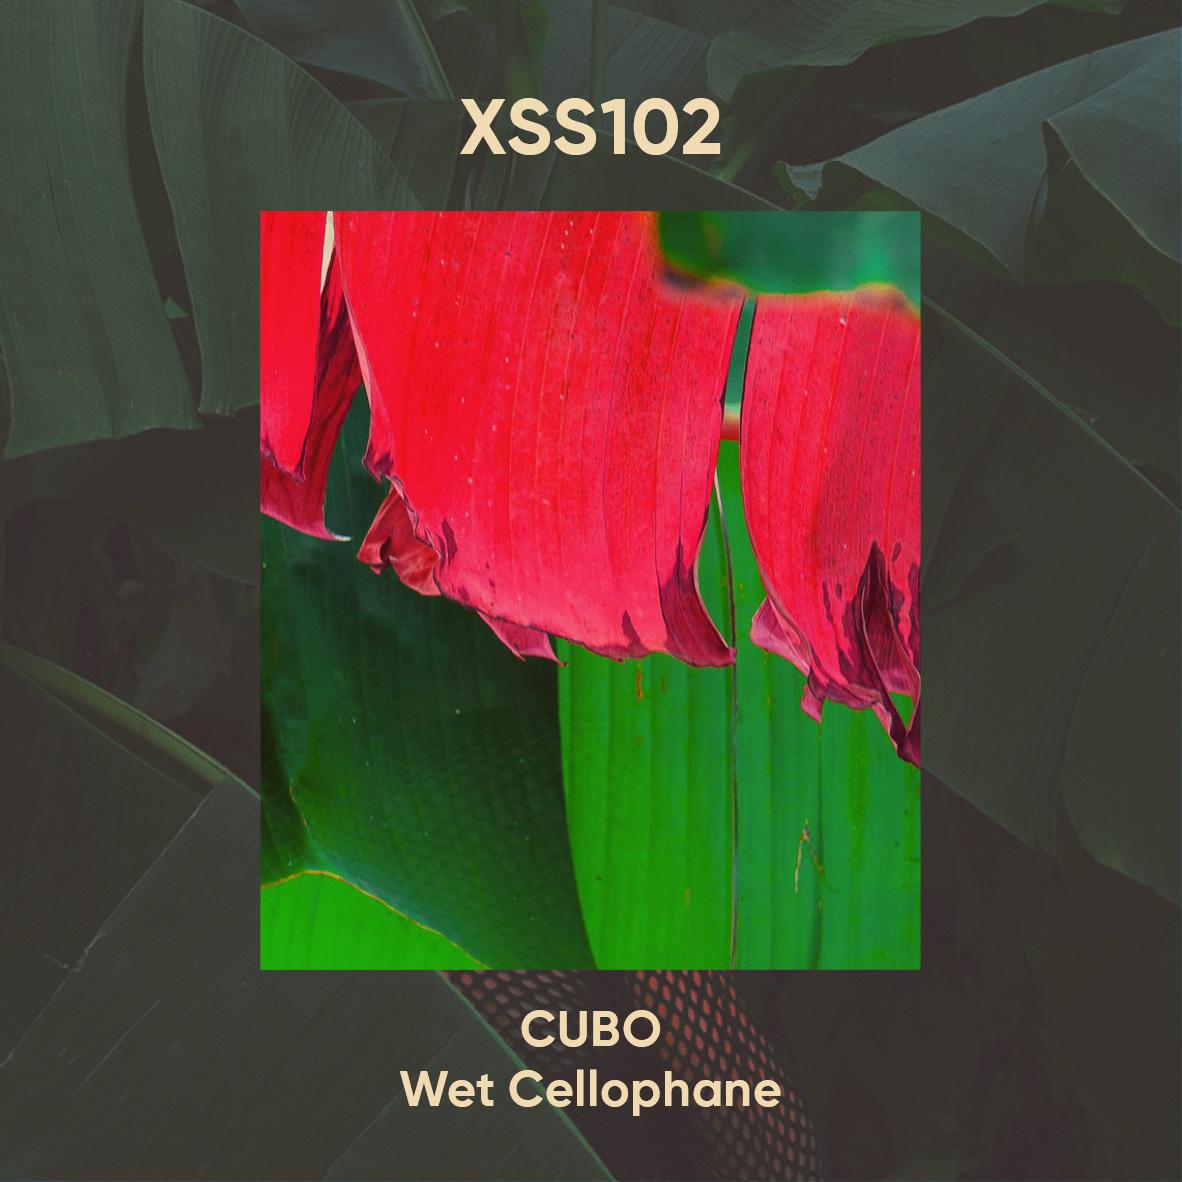 XSS102  |  Cubo  |  Wet  Cellophane